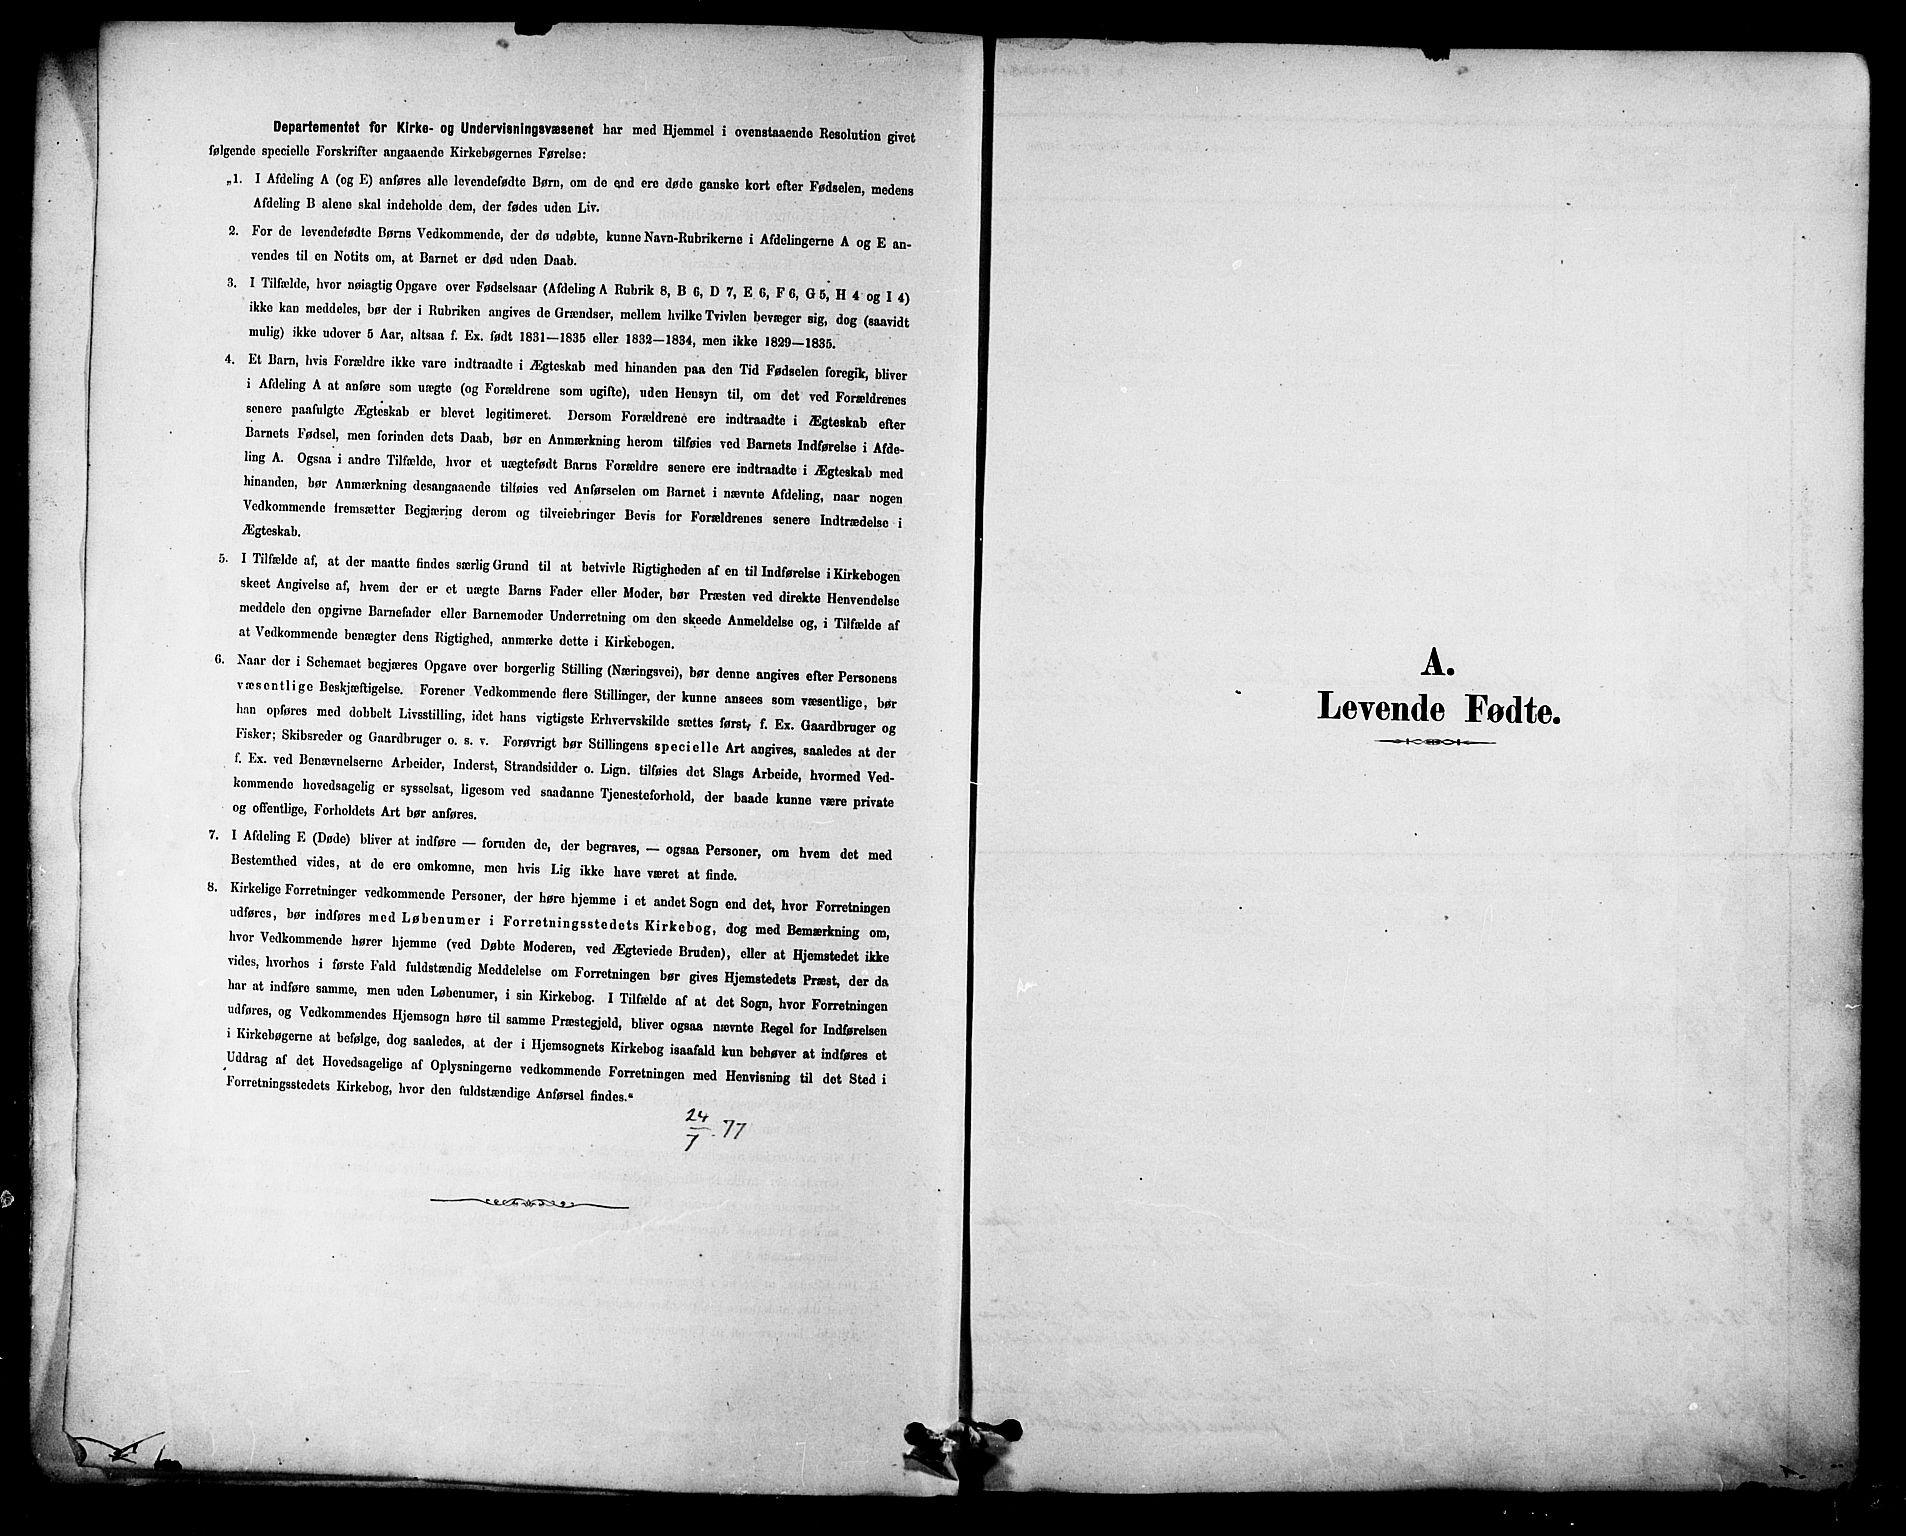 SAT, Ministerialprotokoller, klokkerbøker og fødselsregistre - Nordland, 885/L1204: Ministerialbok nr. 885A05, 1878-1892